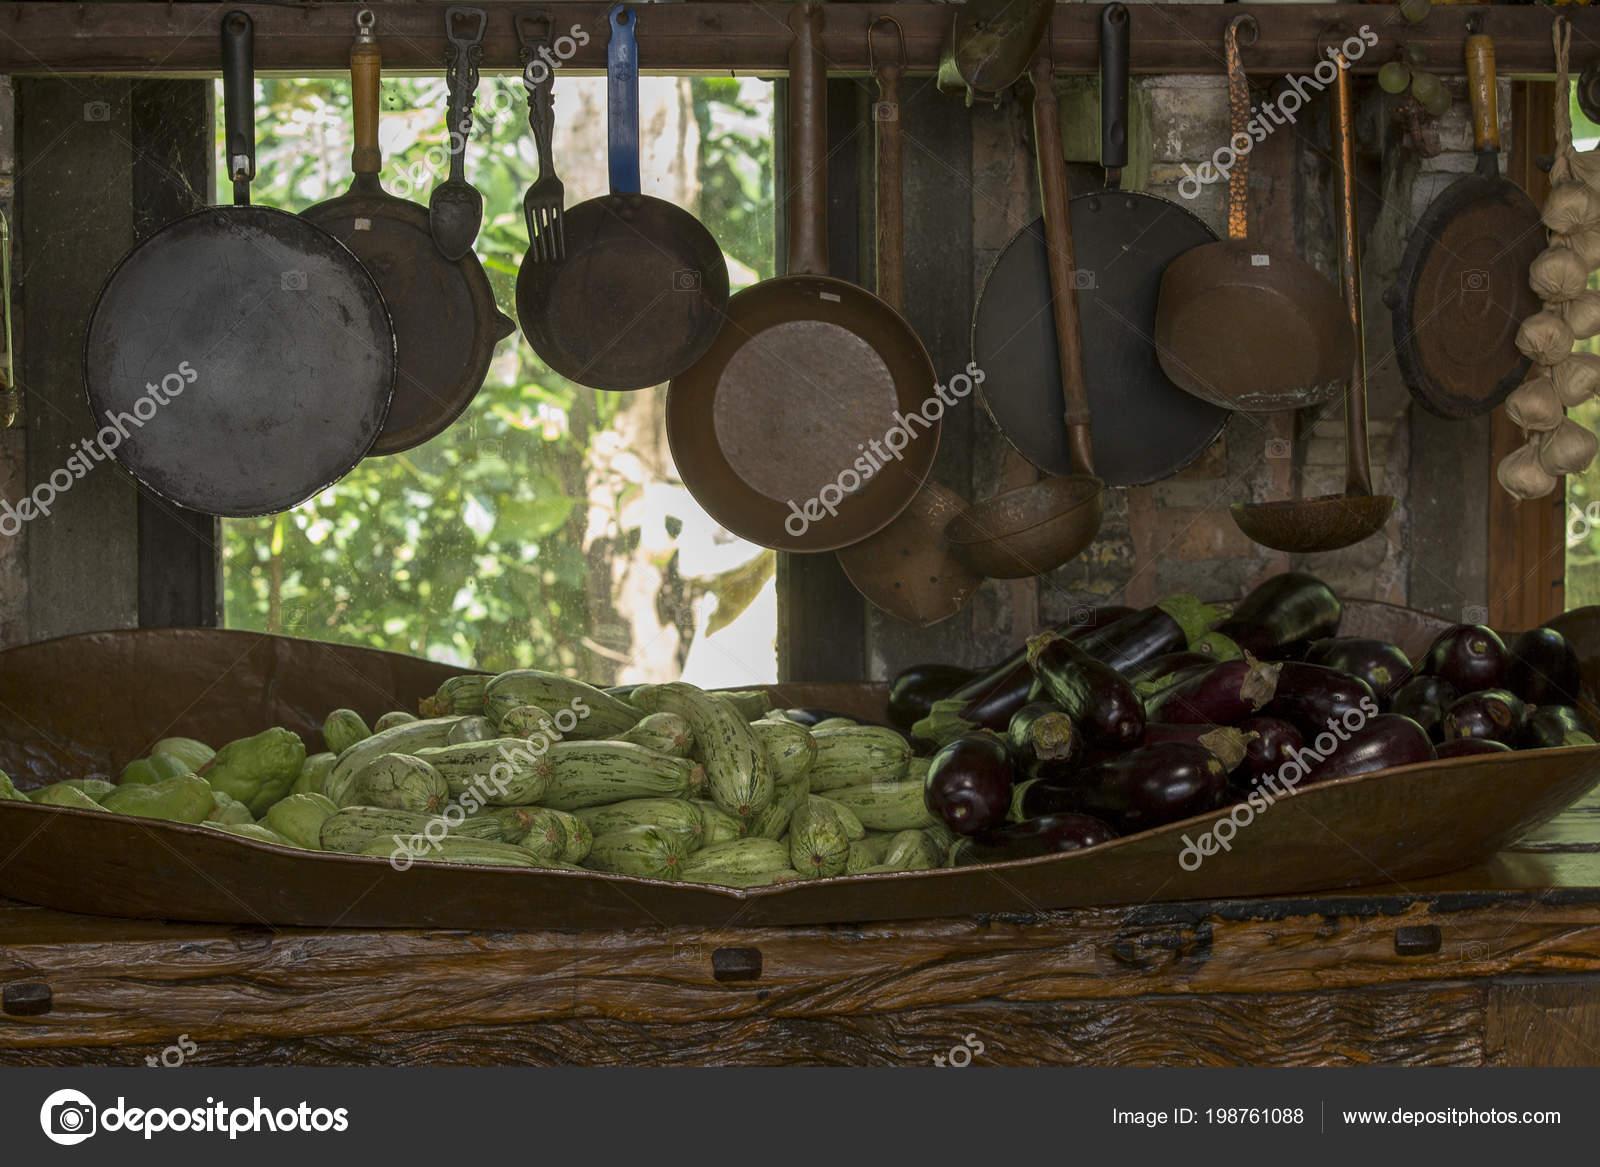 copper kitchen accents orange chairs 铜和铁壶和平底锅作为厨房装饰元素和茶水间 图库照片 c jaboticabafotos 图库